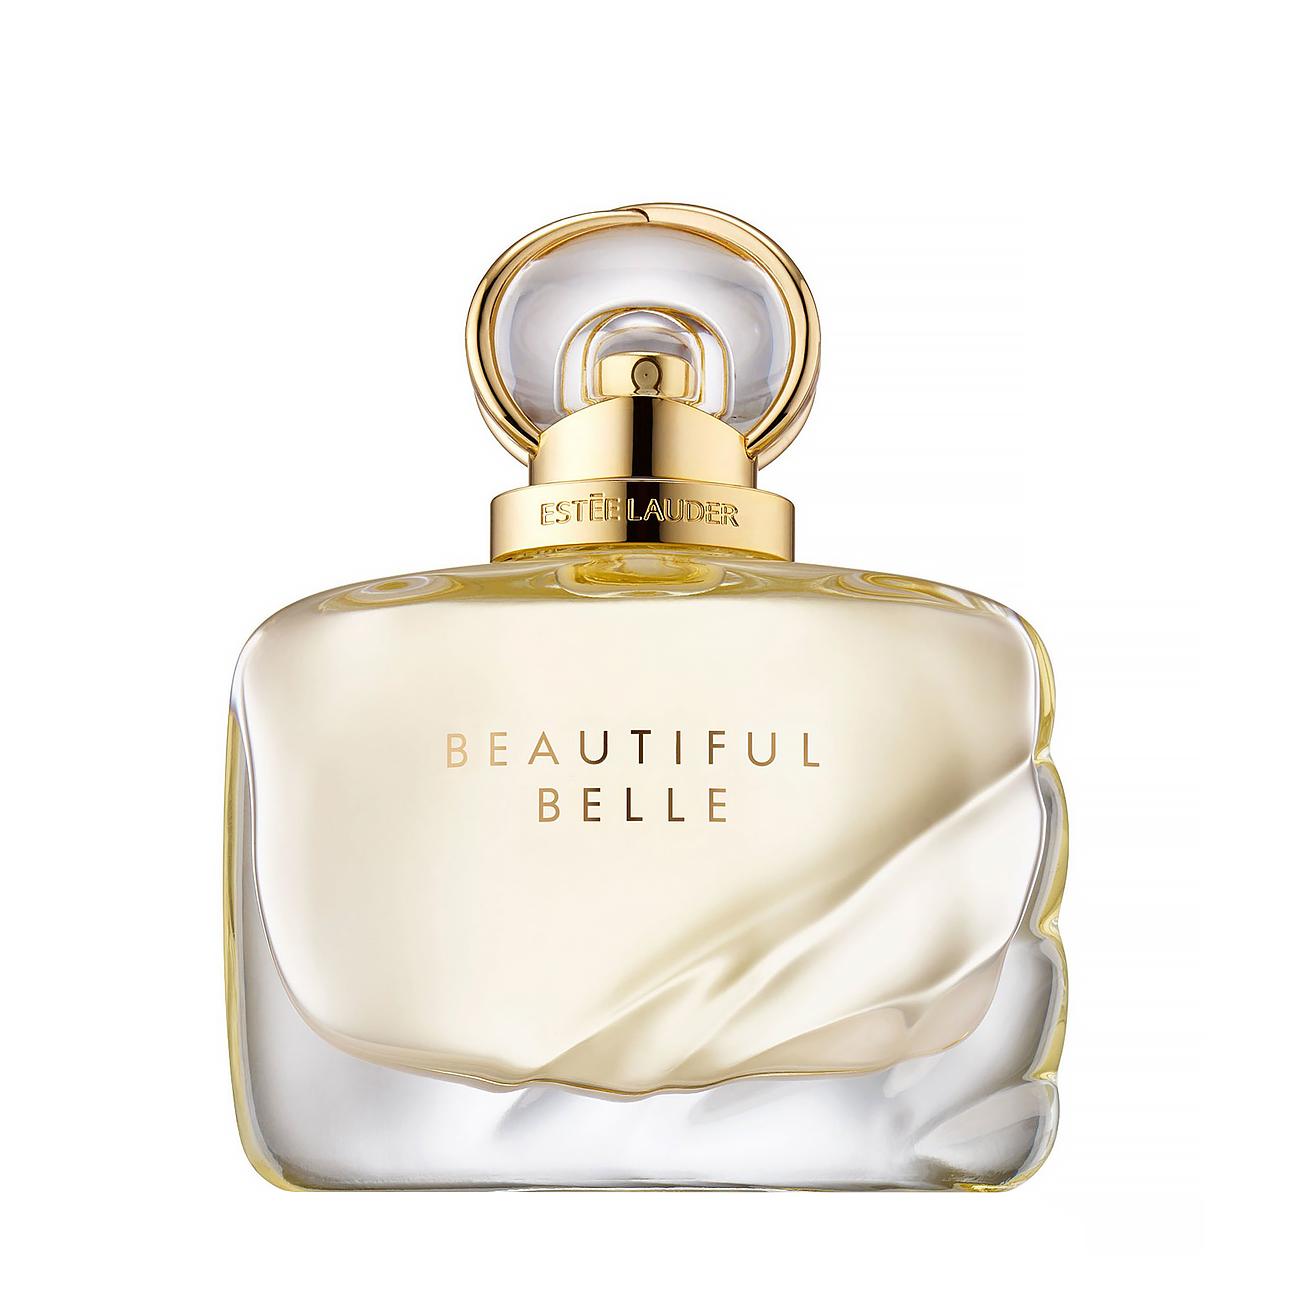 Beautiful Belle 100ml - Estee Lauder